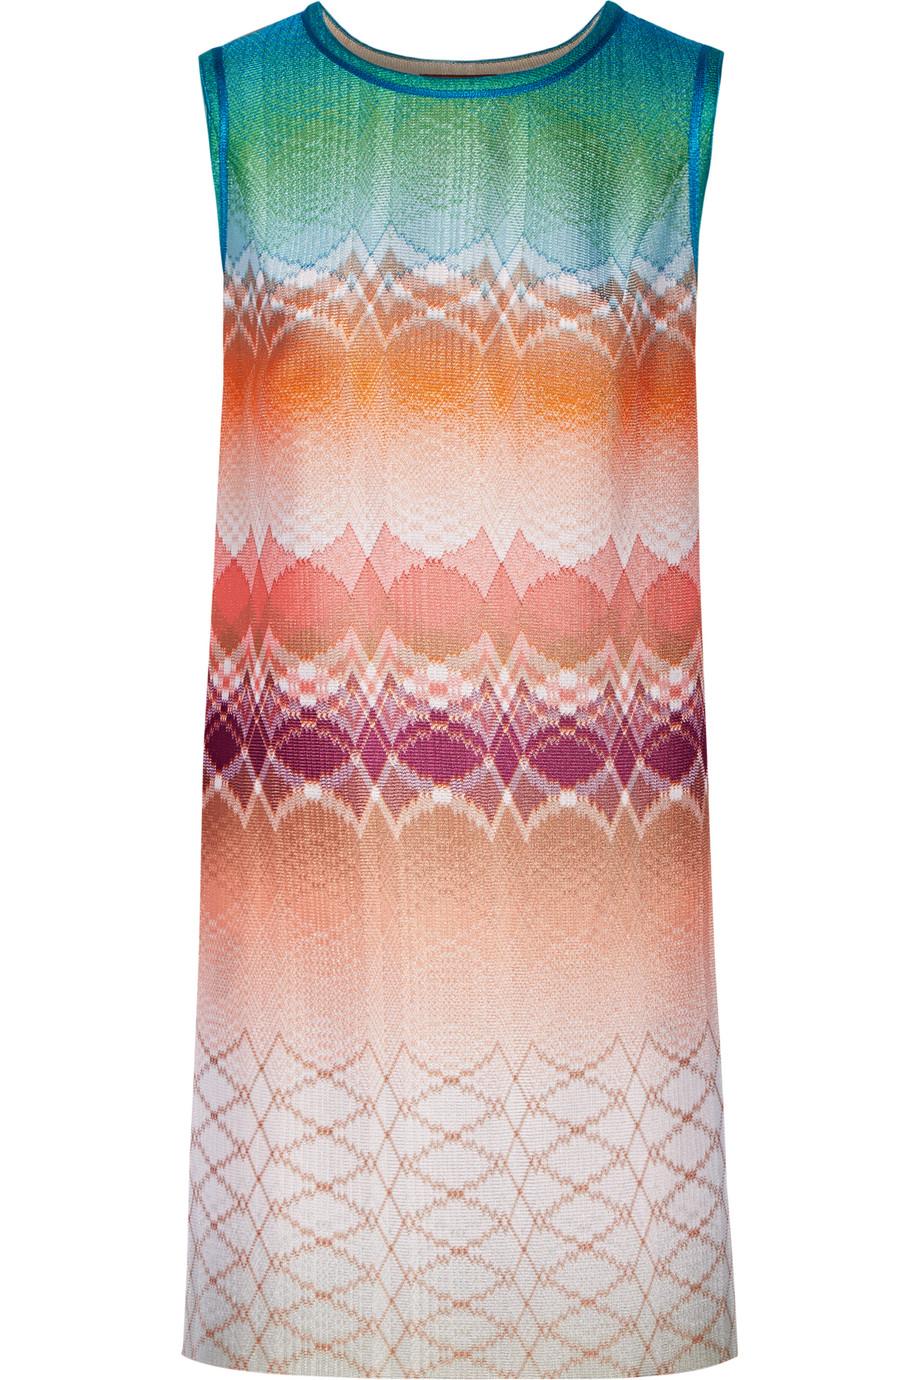 Missoni Crochet-Knit Mini Dress, Cream/Orange, Women's, Size: 40